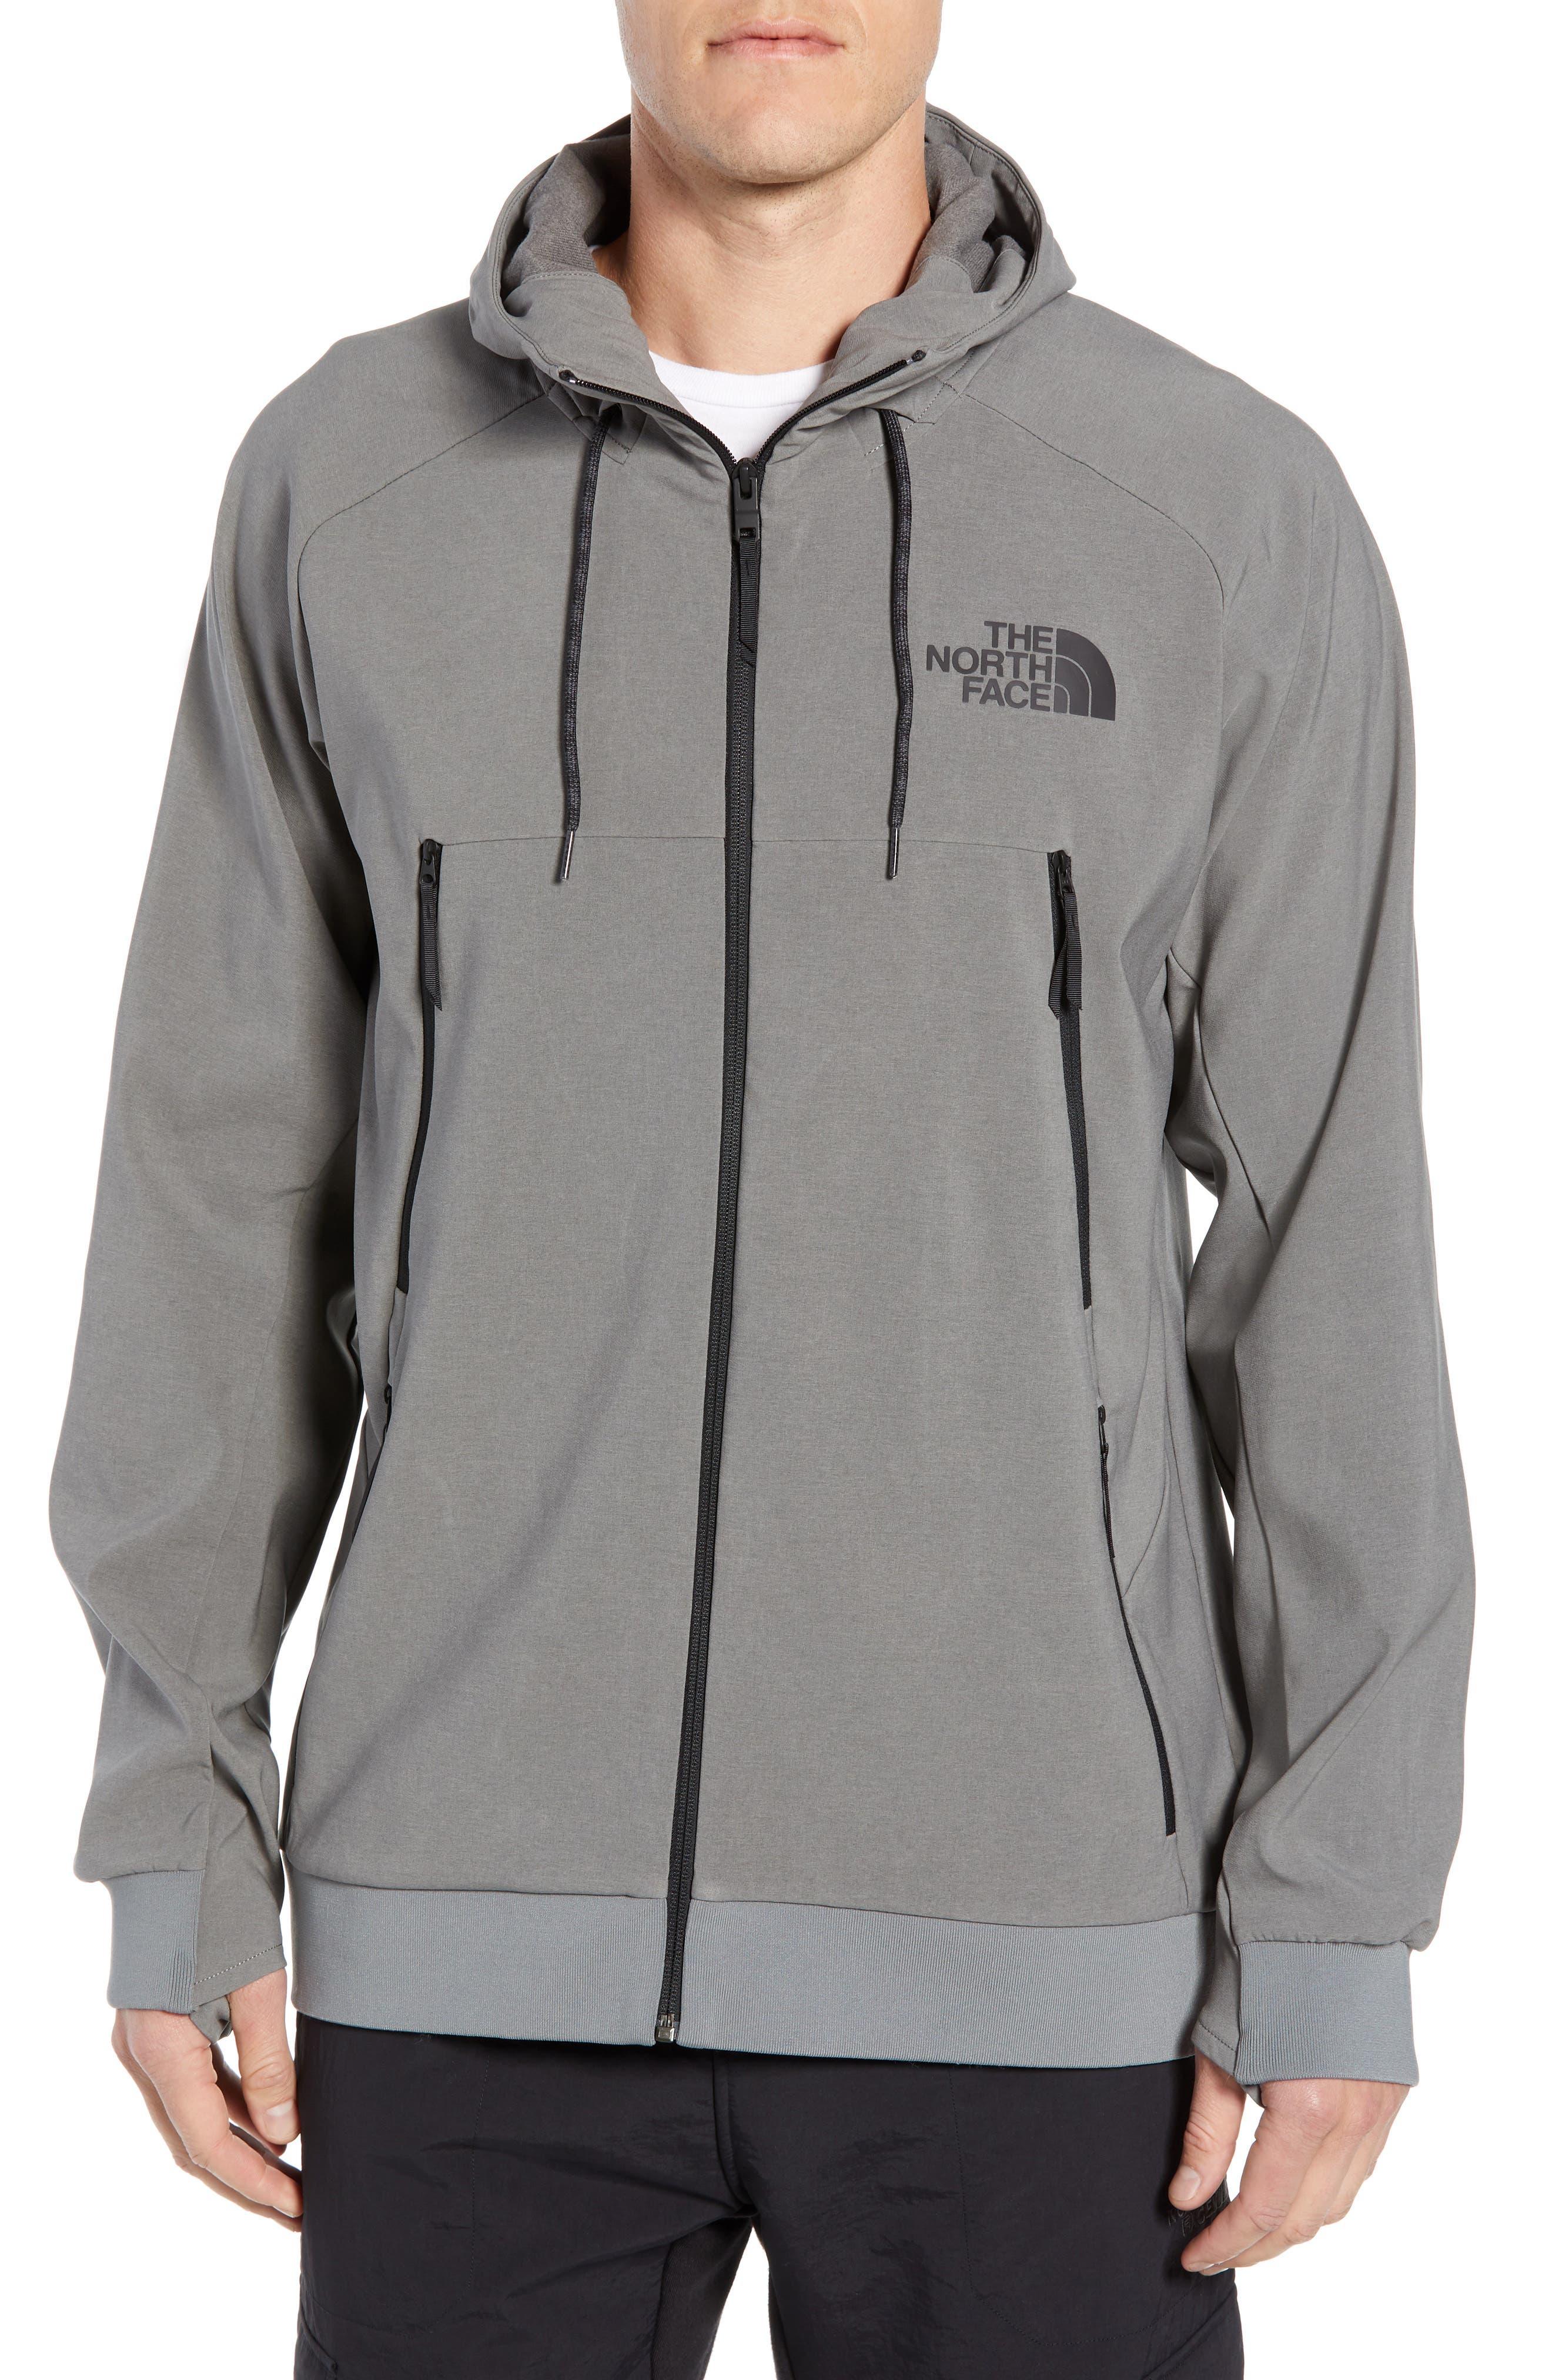 The North Face Tekno Zip Jacket, Grey